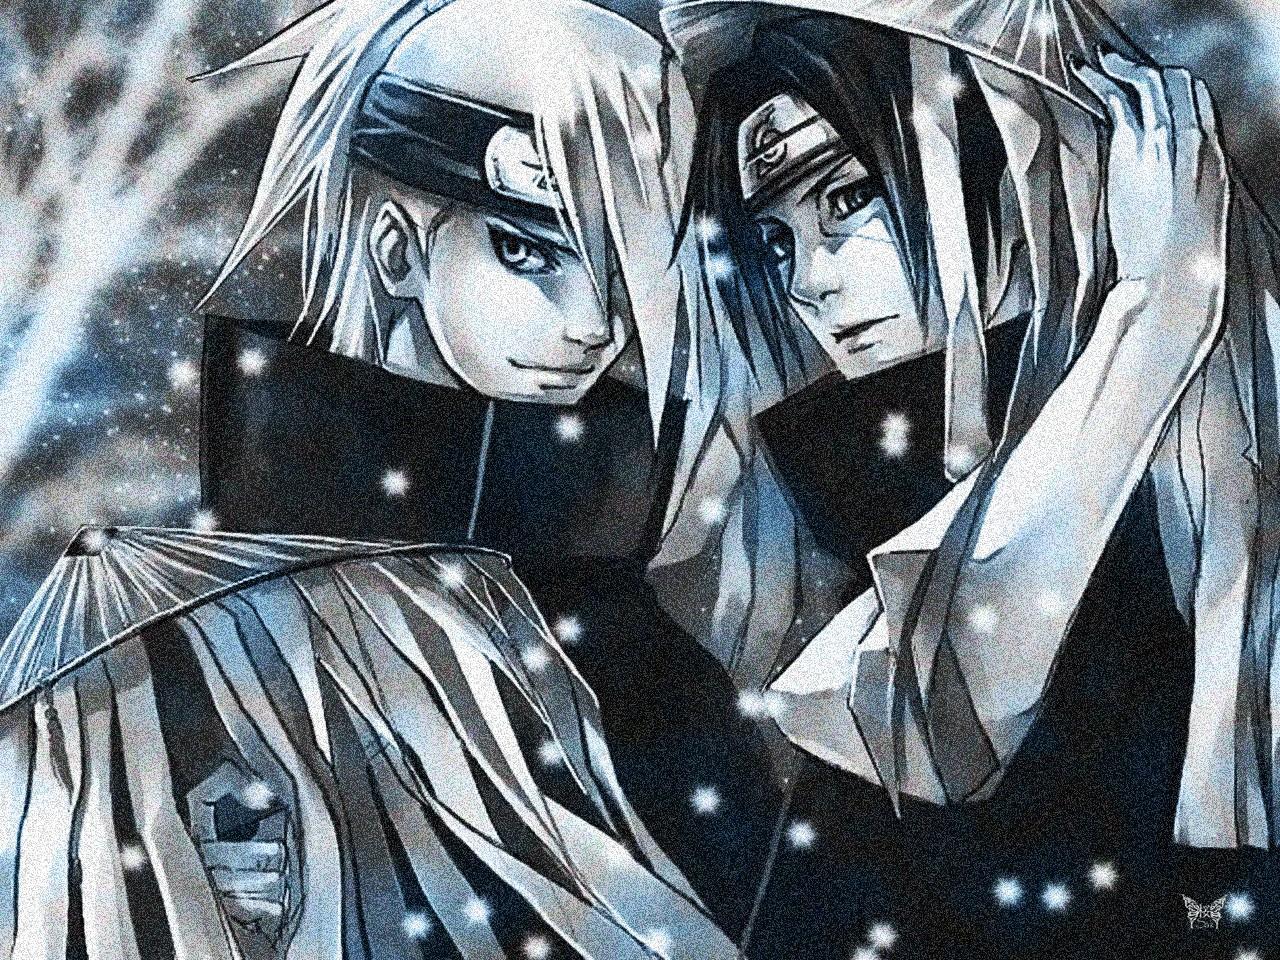 Wallpaper Gambar Ilustrasi Anime Naruto Shippuuden